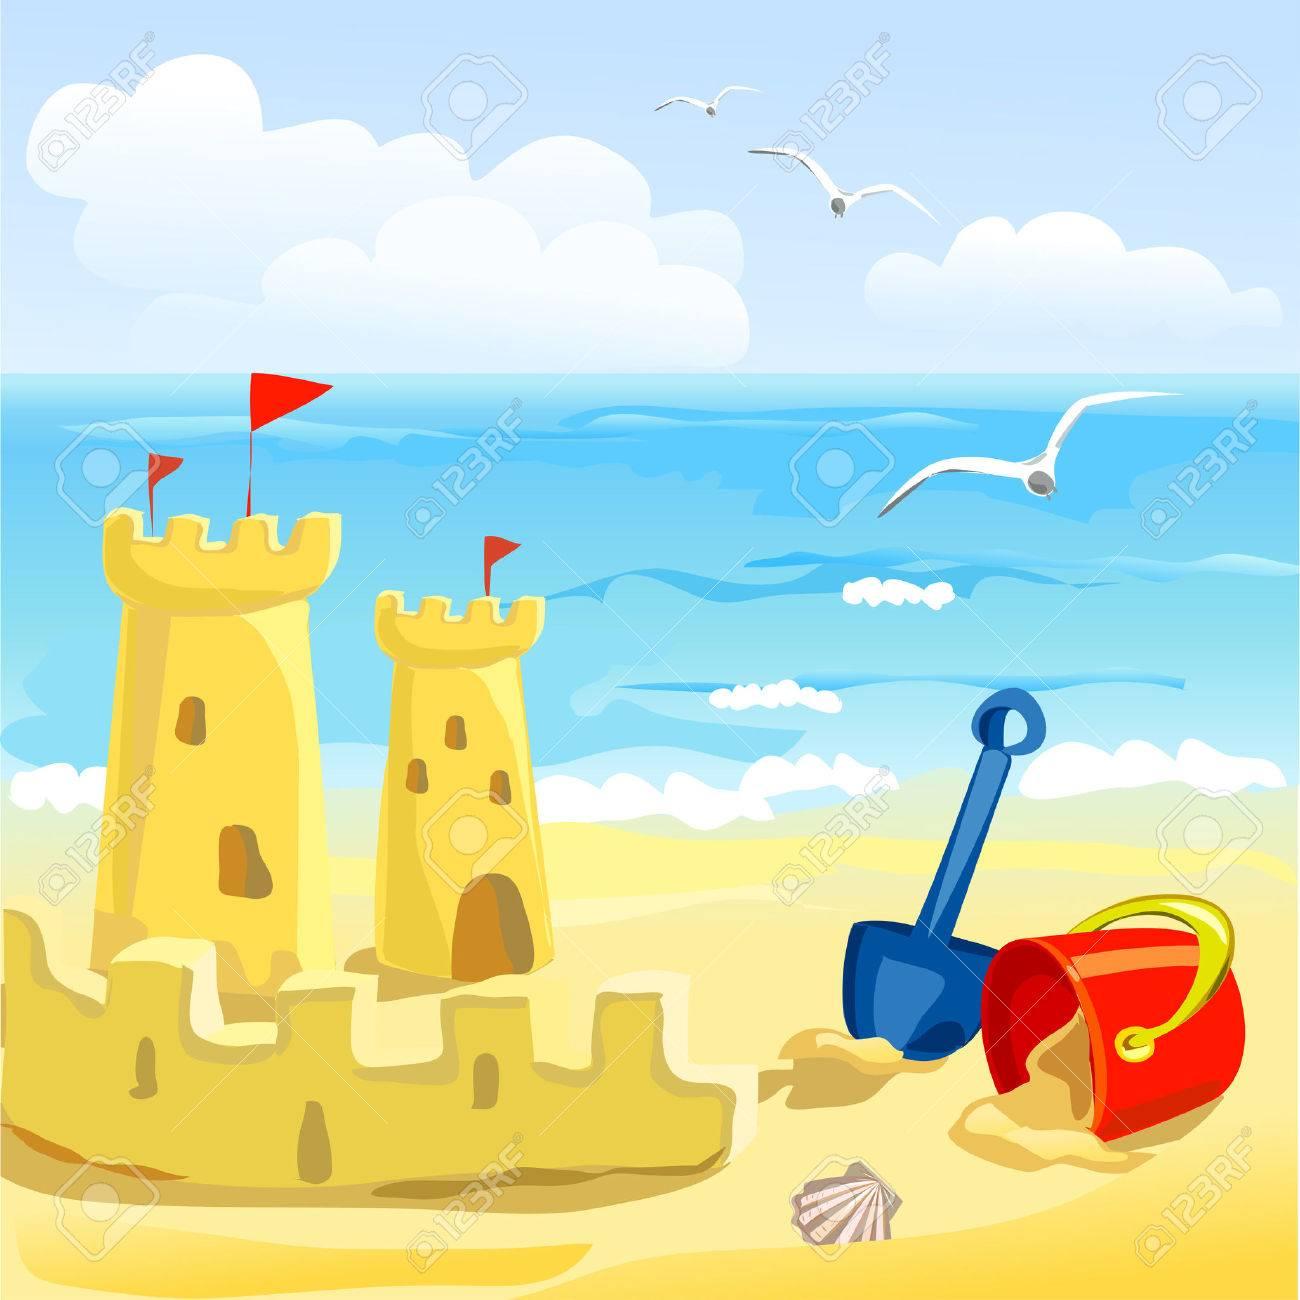 beach with children's toys and sandcastles. vector illustration Standard-Bild - 26233707